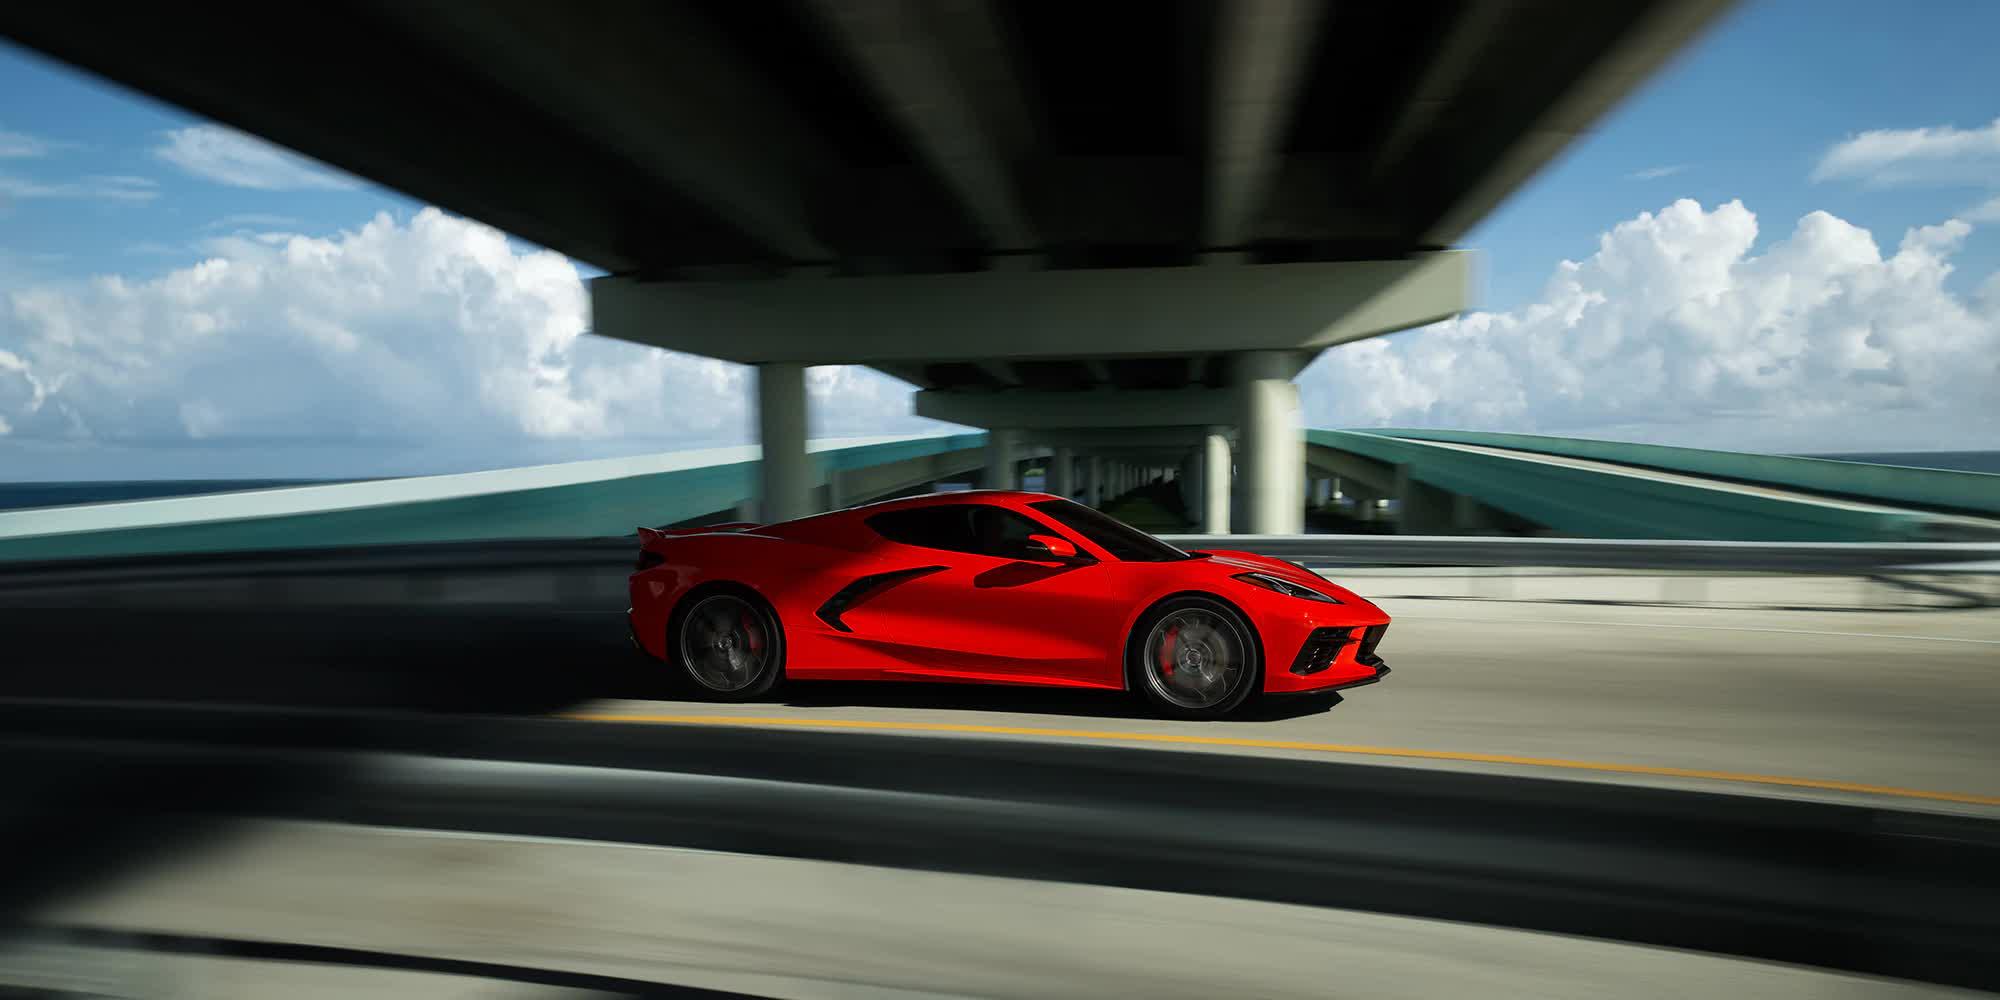 Corvette C8 Stingray Rosso